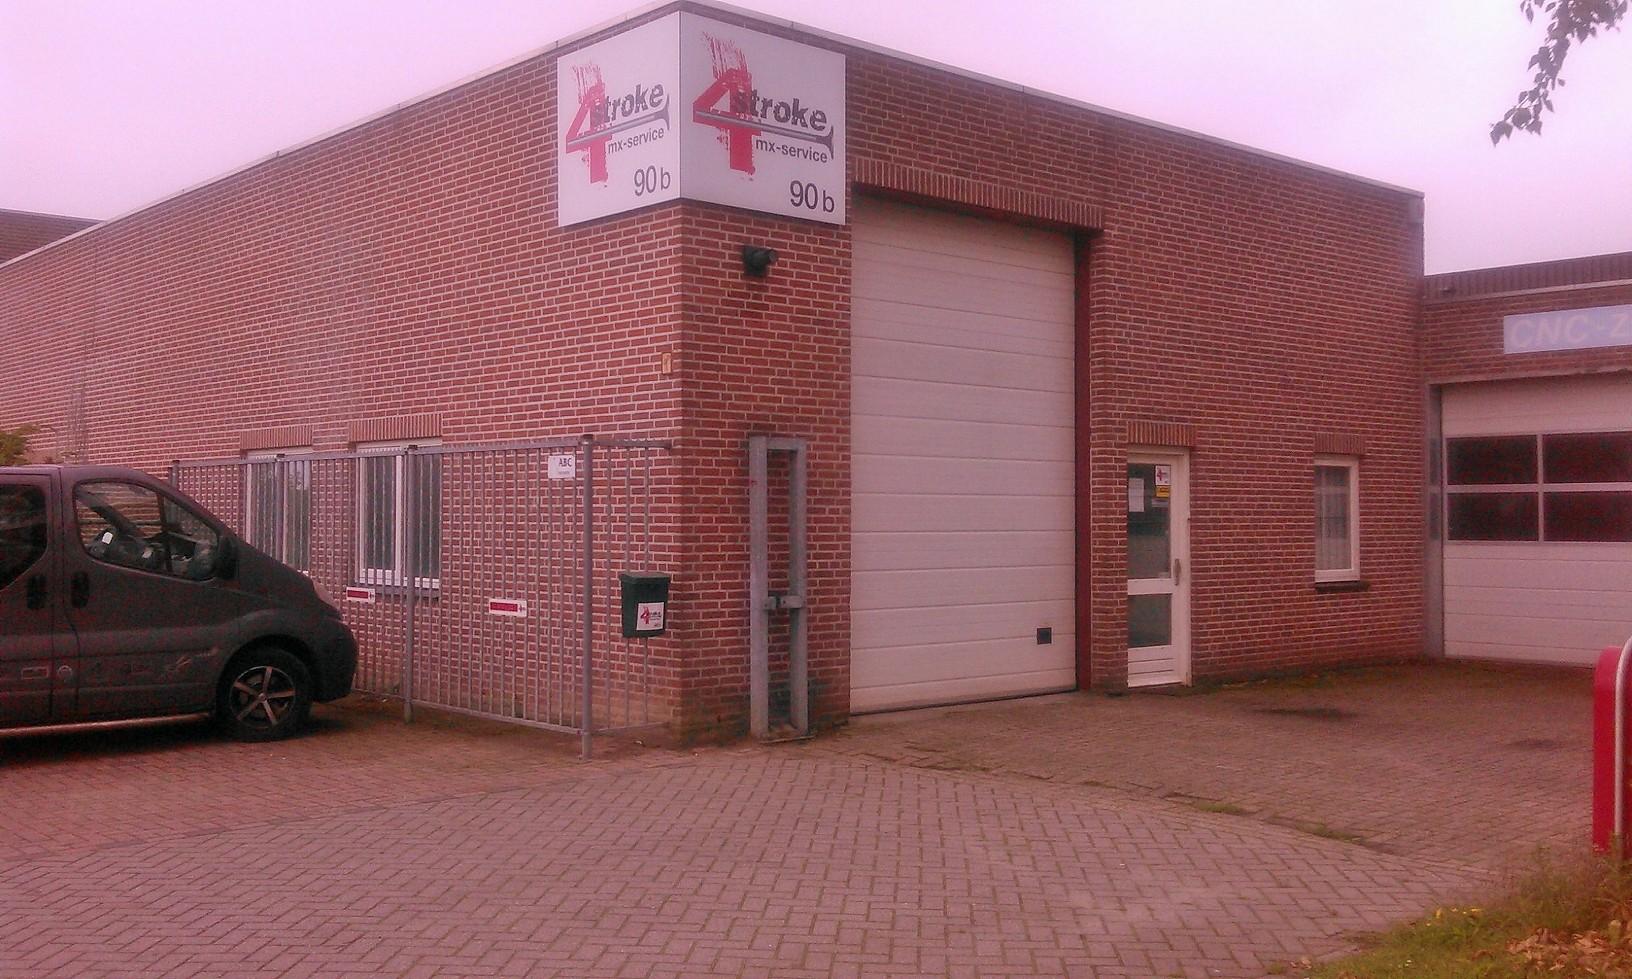 Bedrijfsruimte Waalwijk Industrieweg 90b